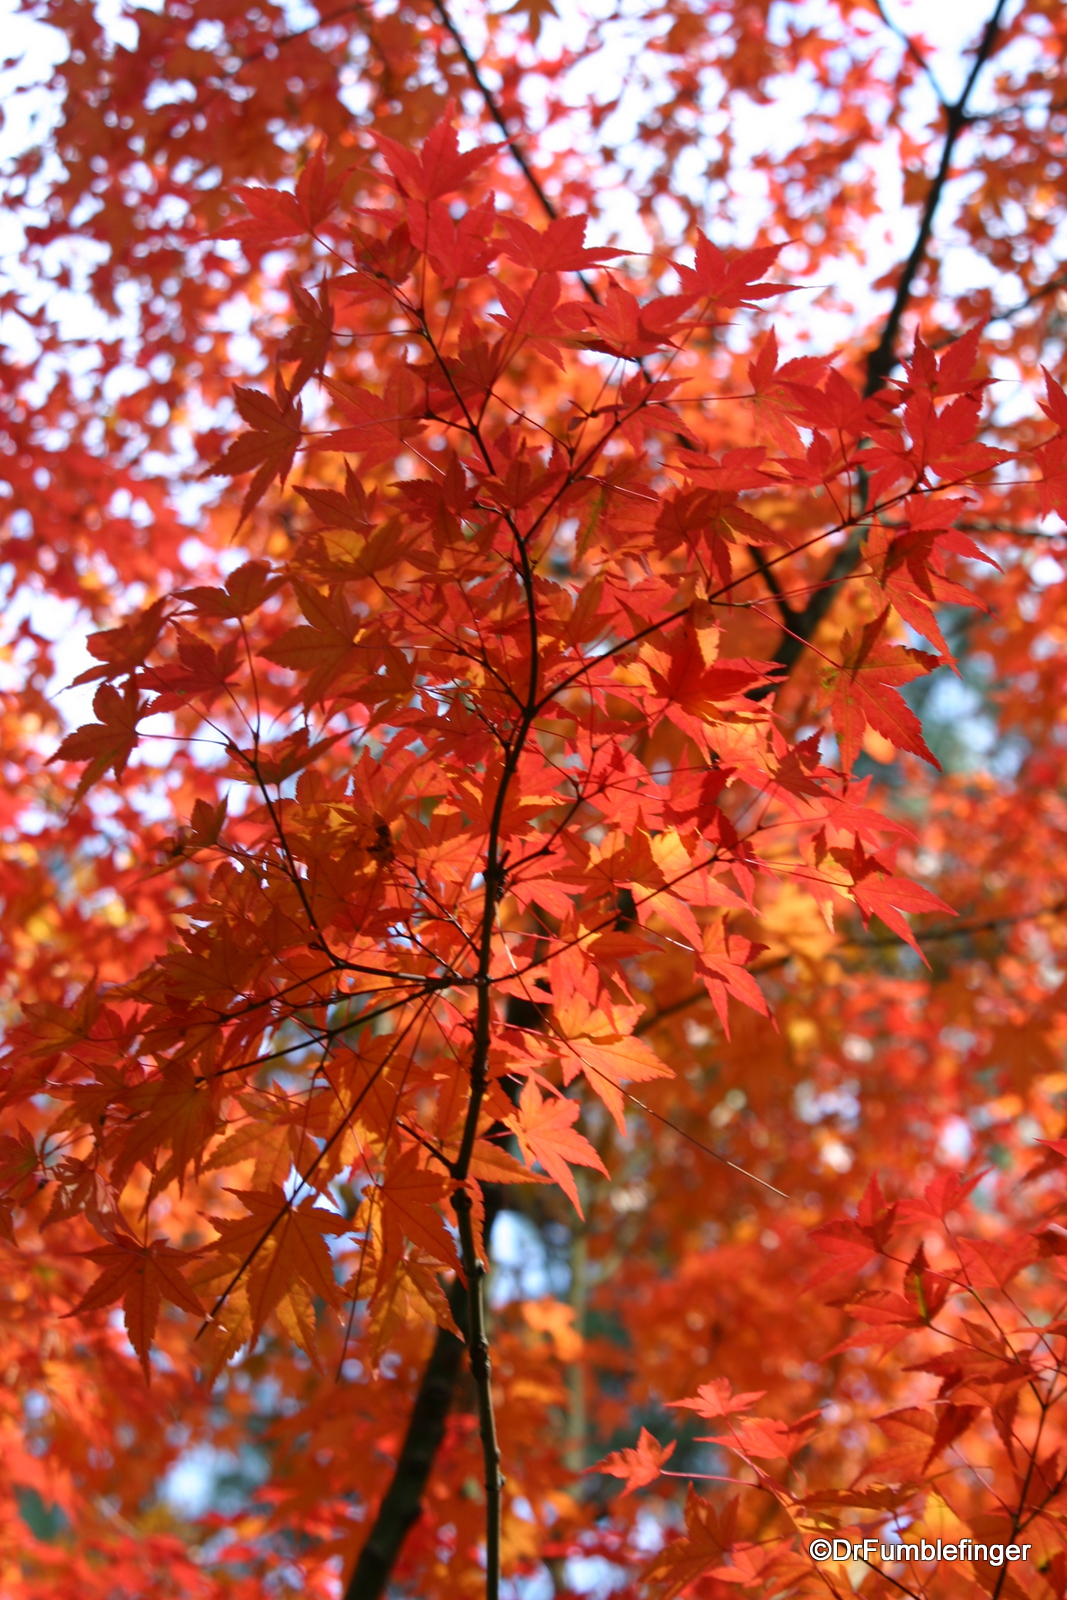 A fall visit to the nishinomiya tsutakawa japanese garden for Nishinomiya tsutakawa japanese garden koi